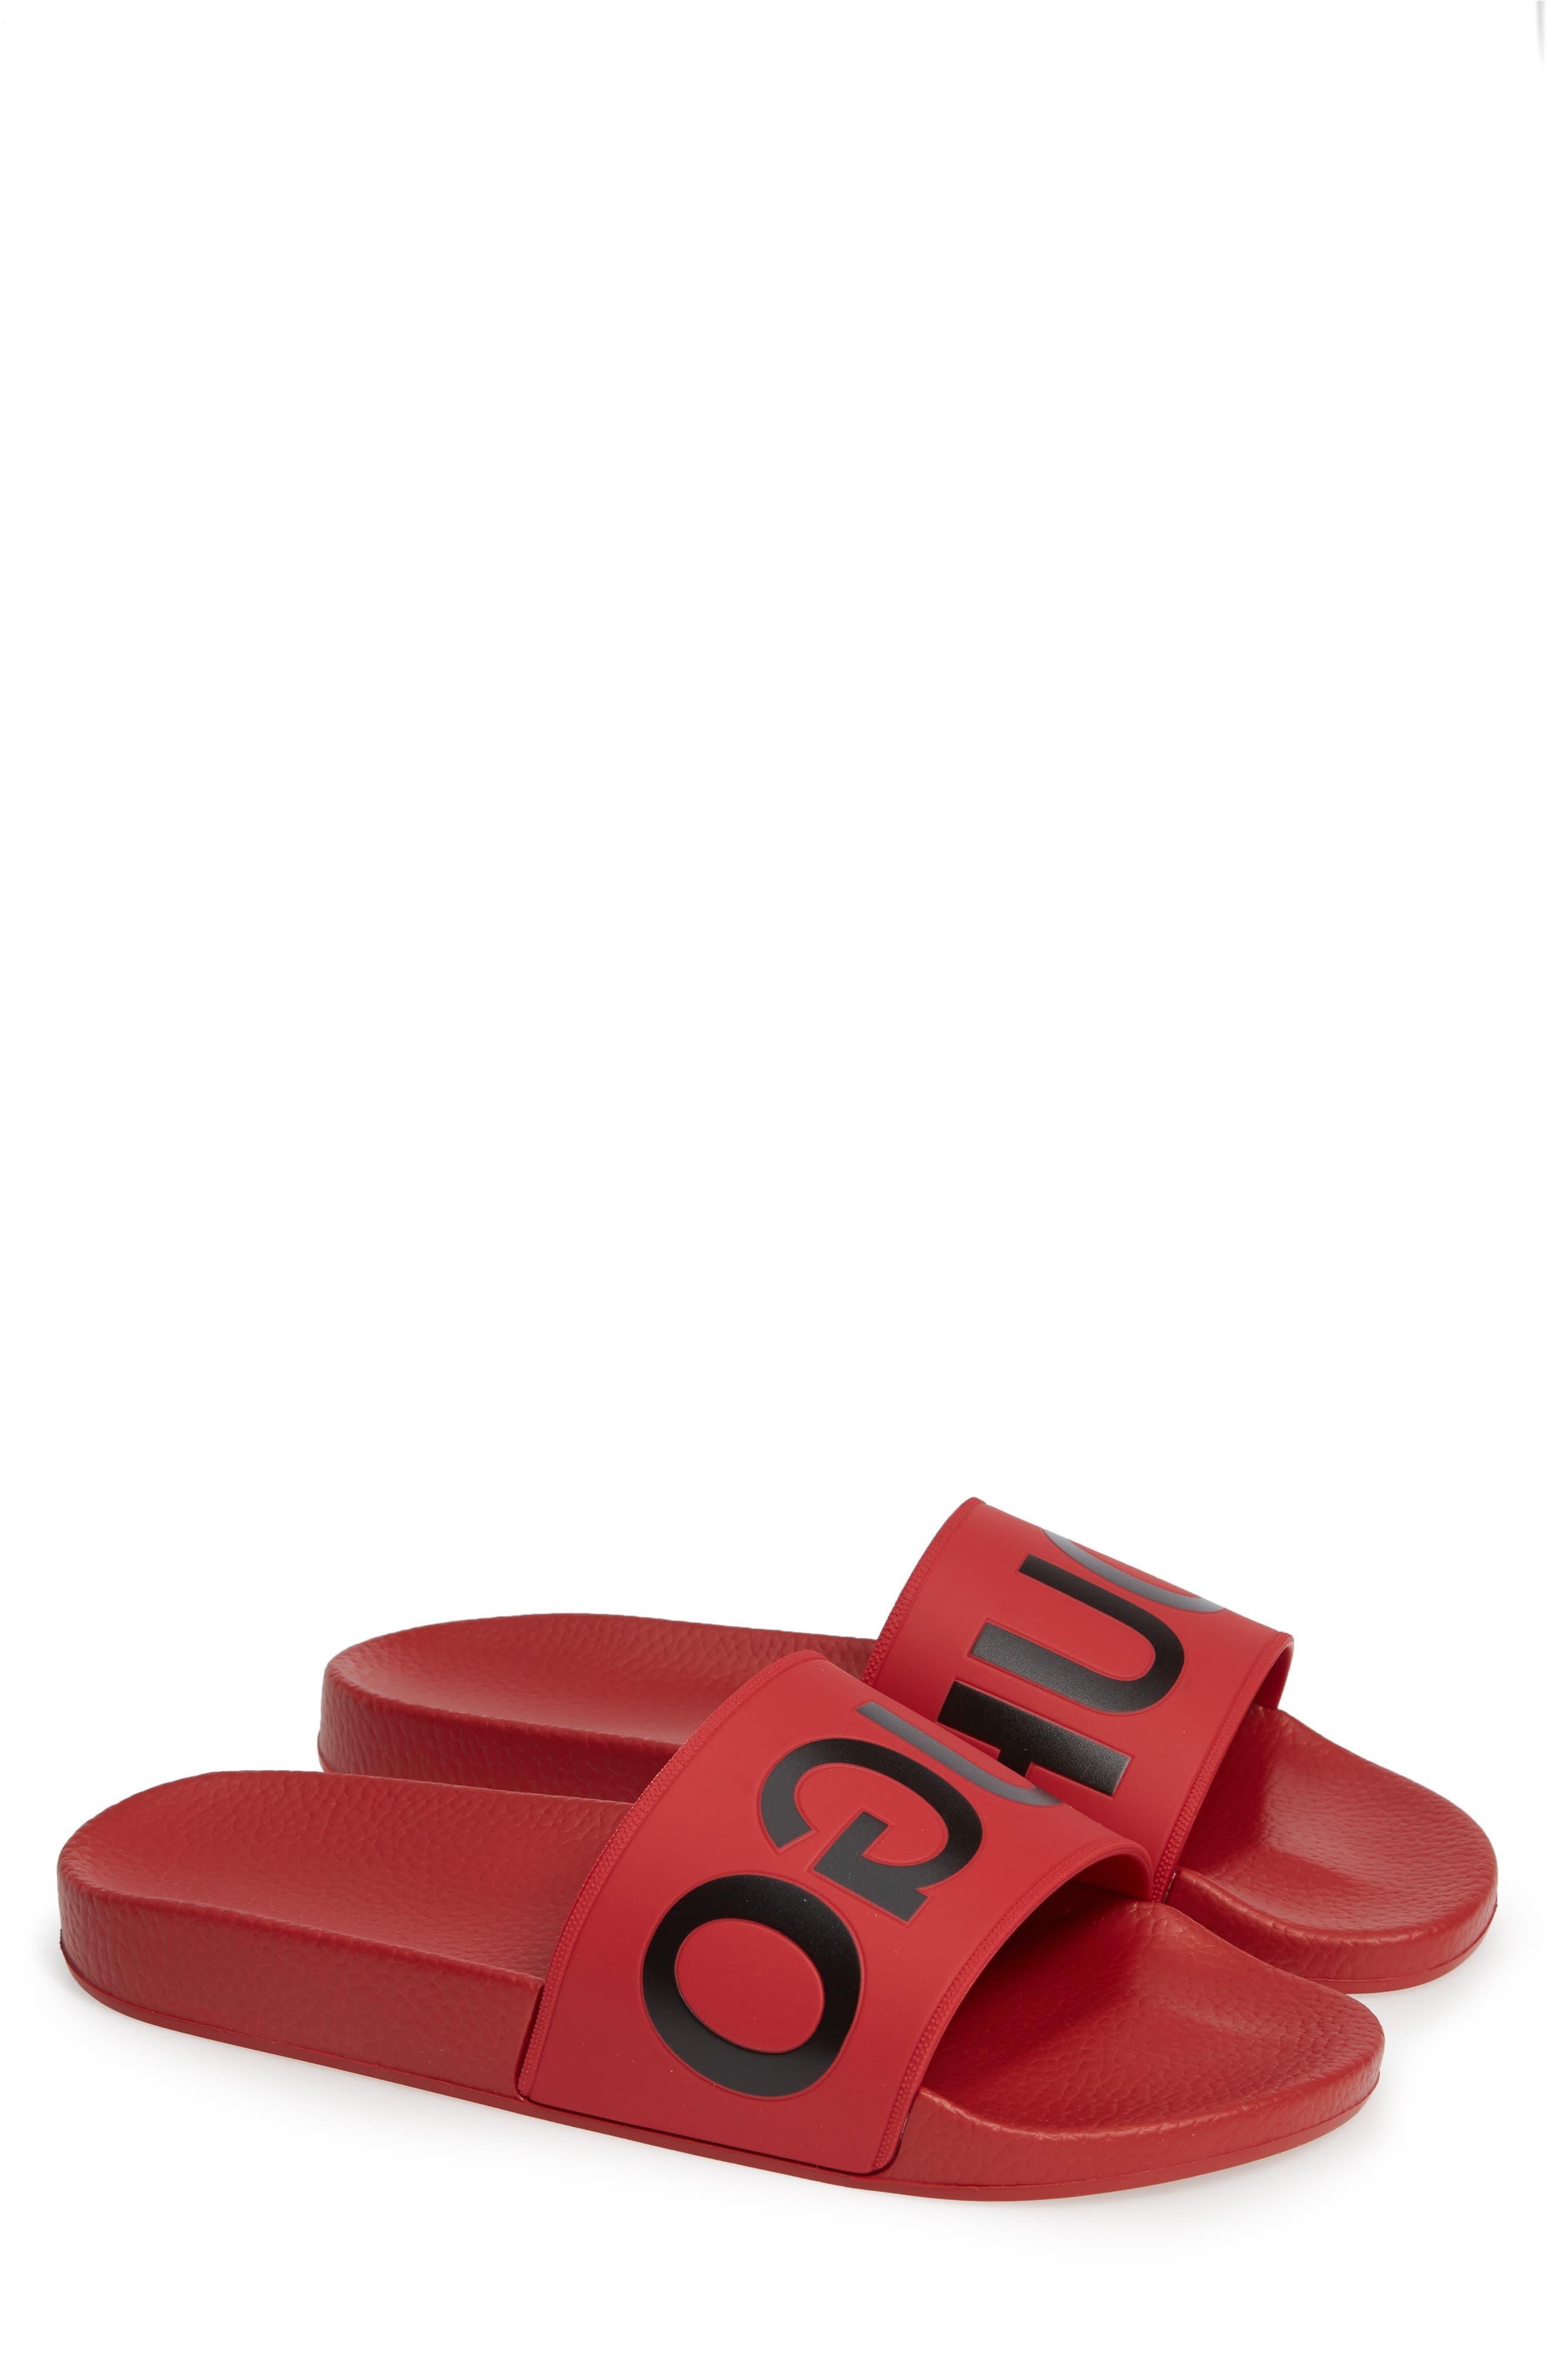 Time Out Slide Sandal,                             Main thumbnail 1, color,                             MEDIUM RED